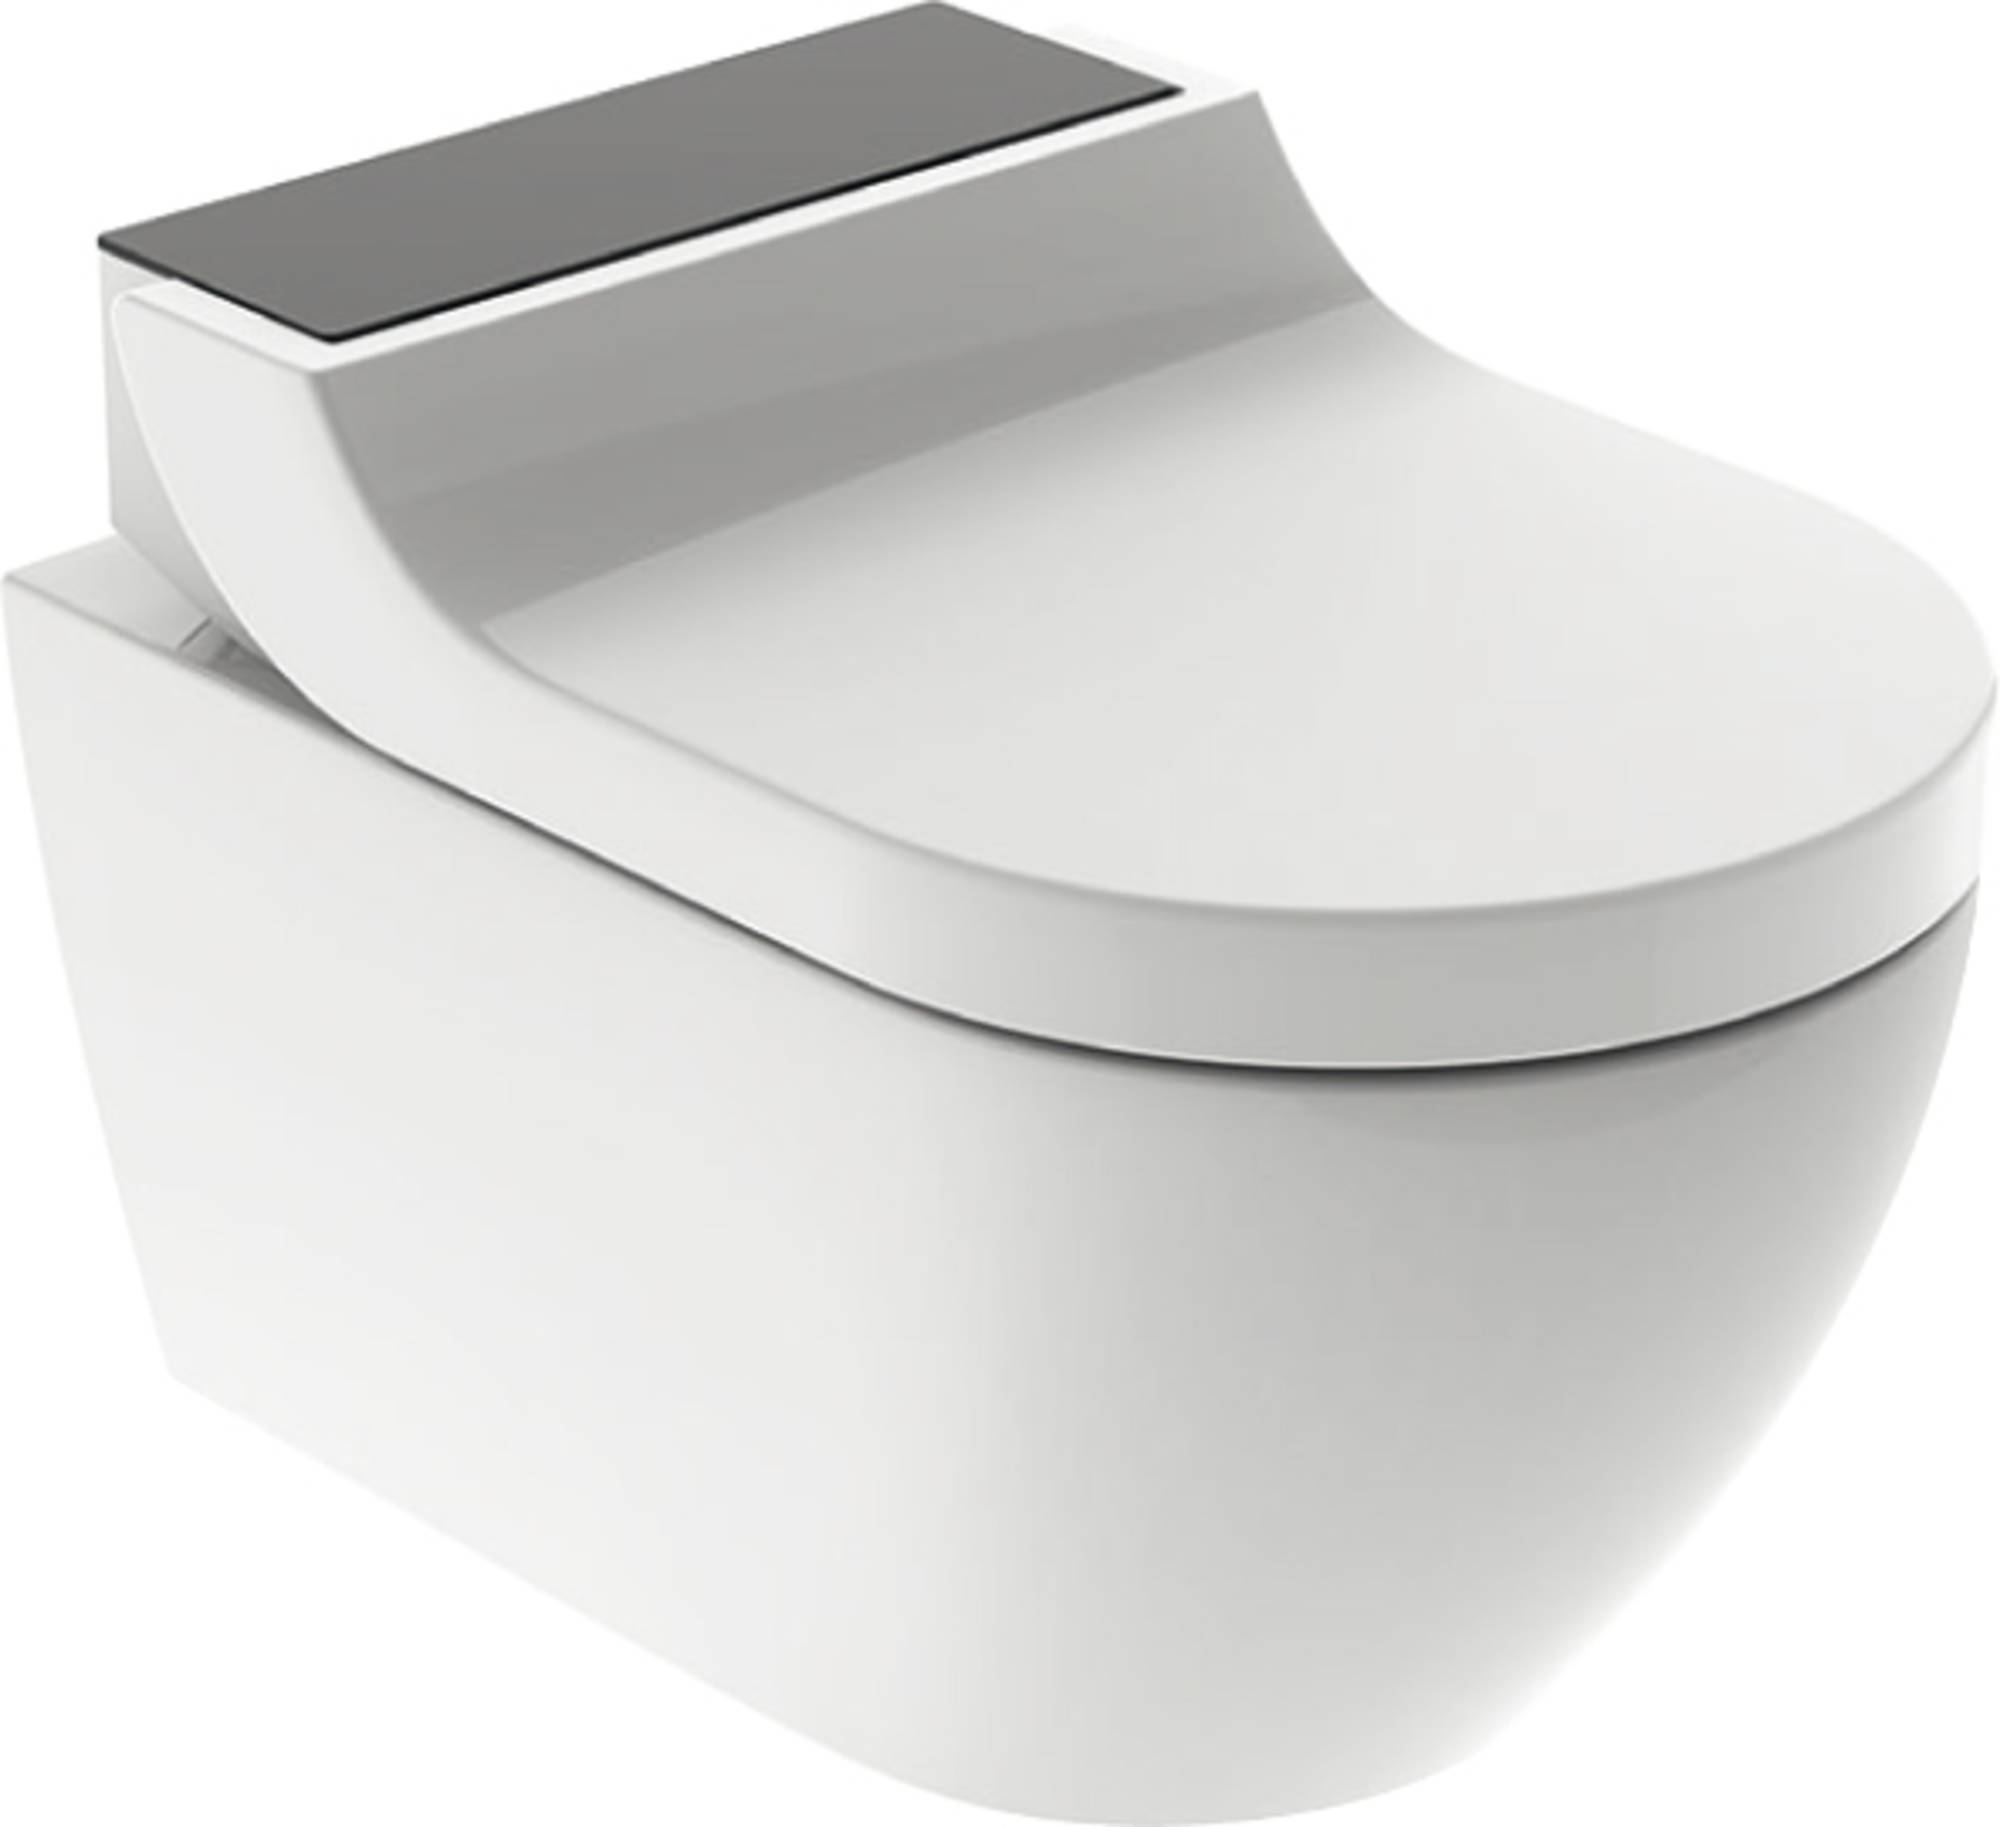 Geberit Aquaclean Tuma comfort wandcloset met douche wc, wit